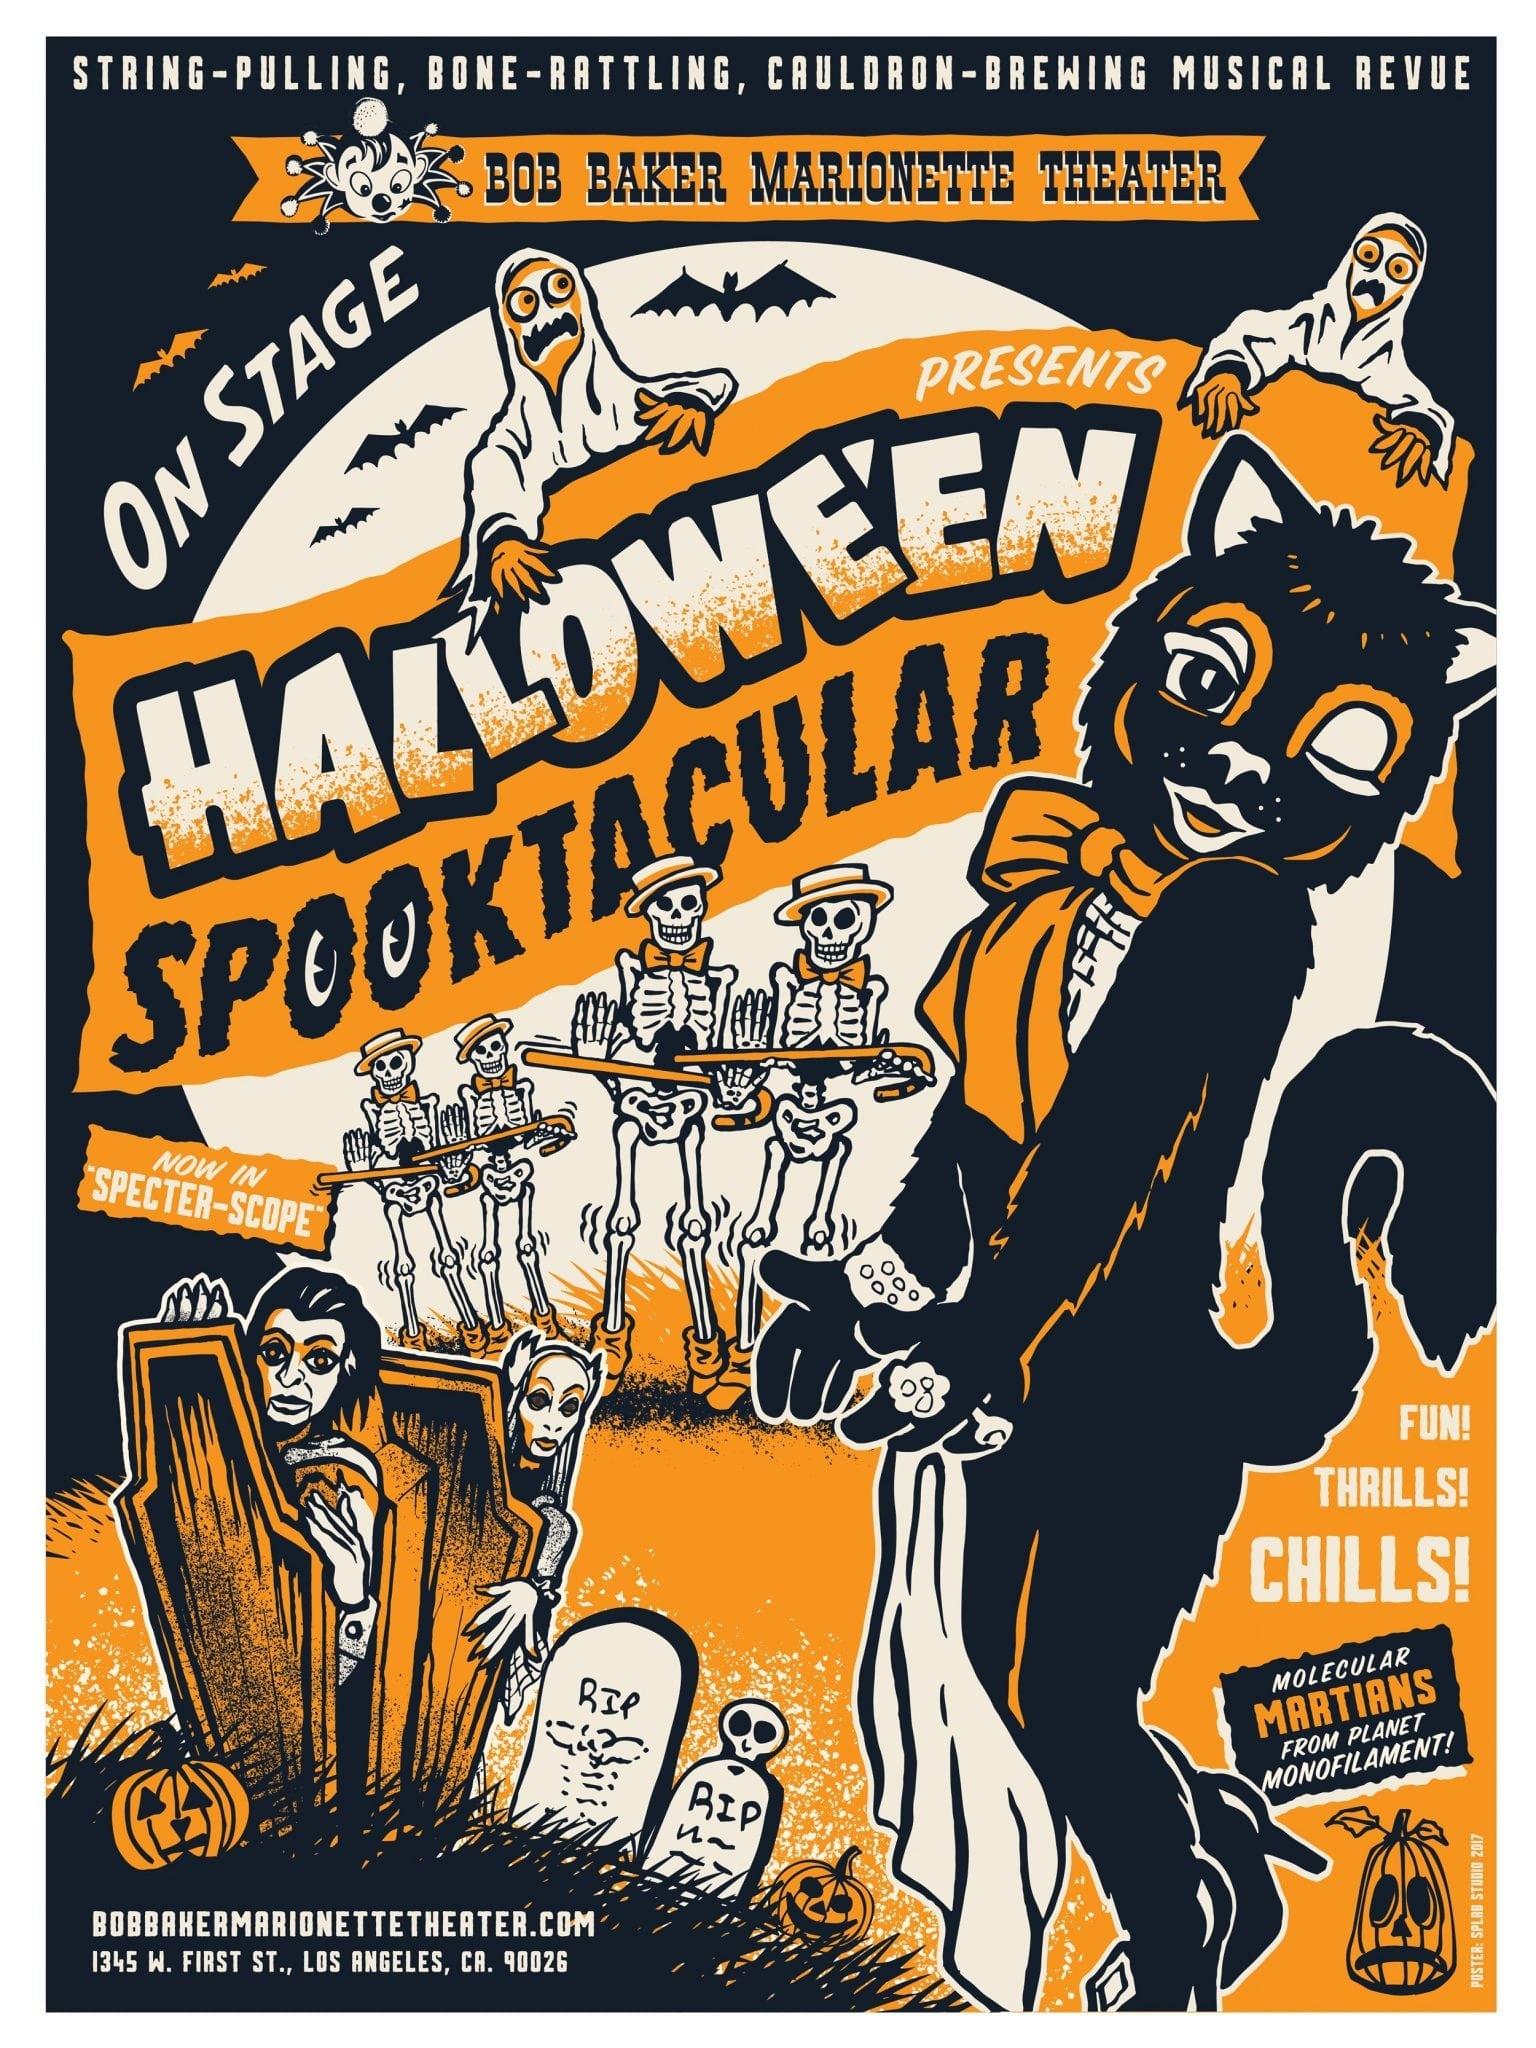 Bob Baker's Hallowe'en Spooktacular